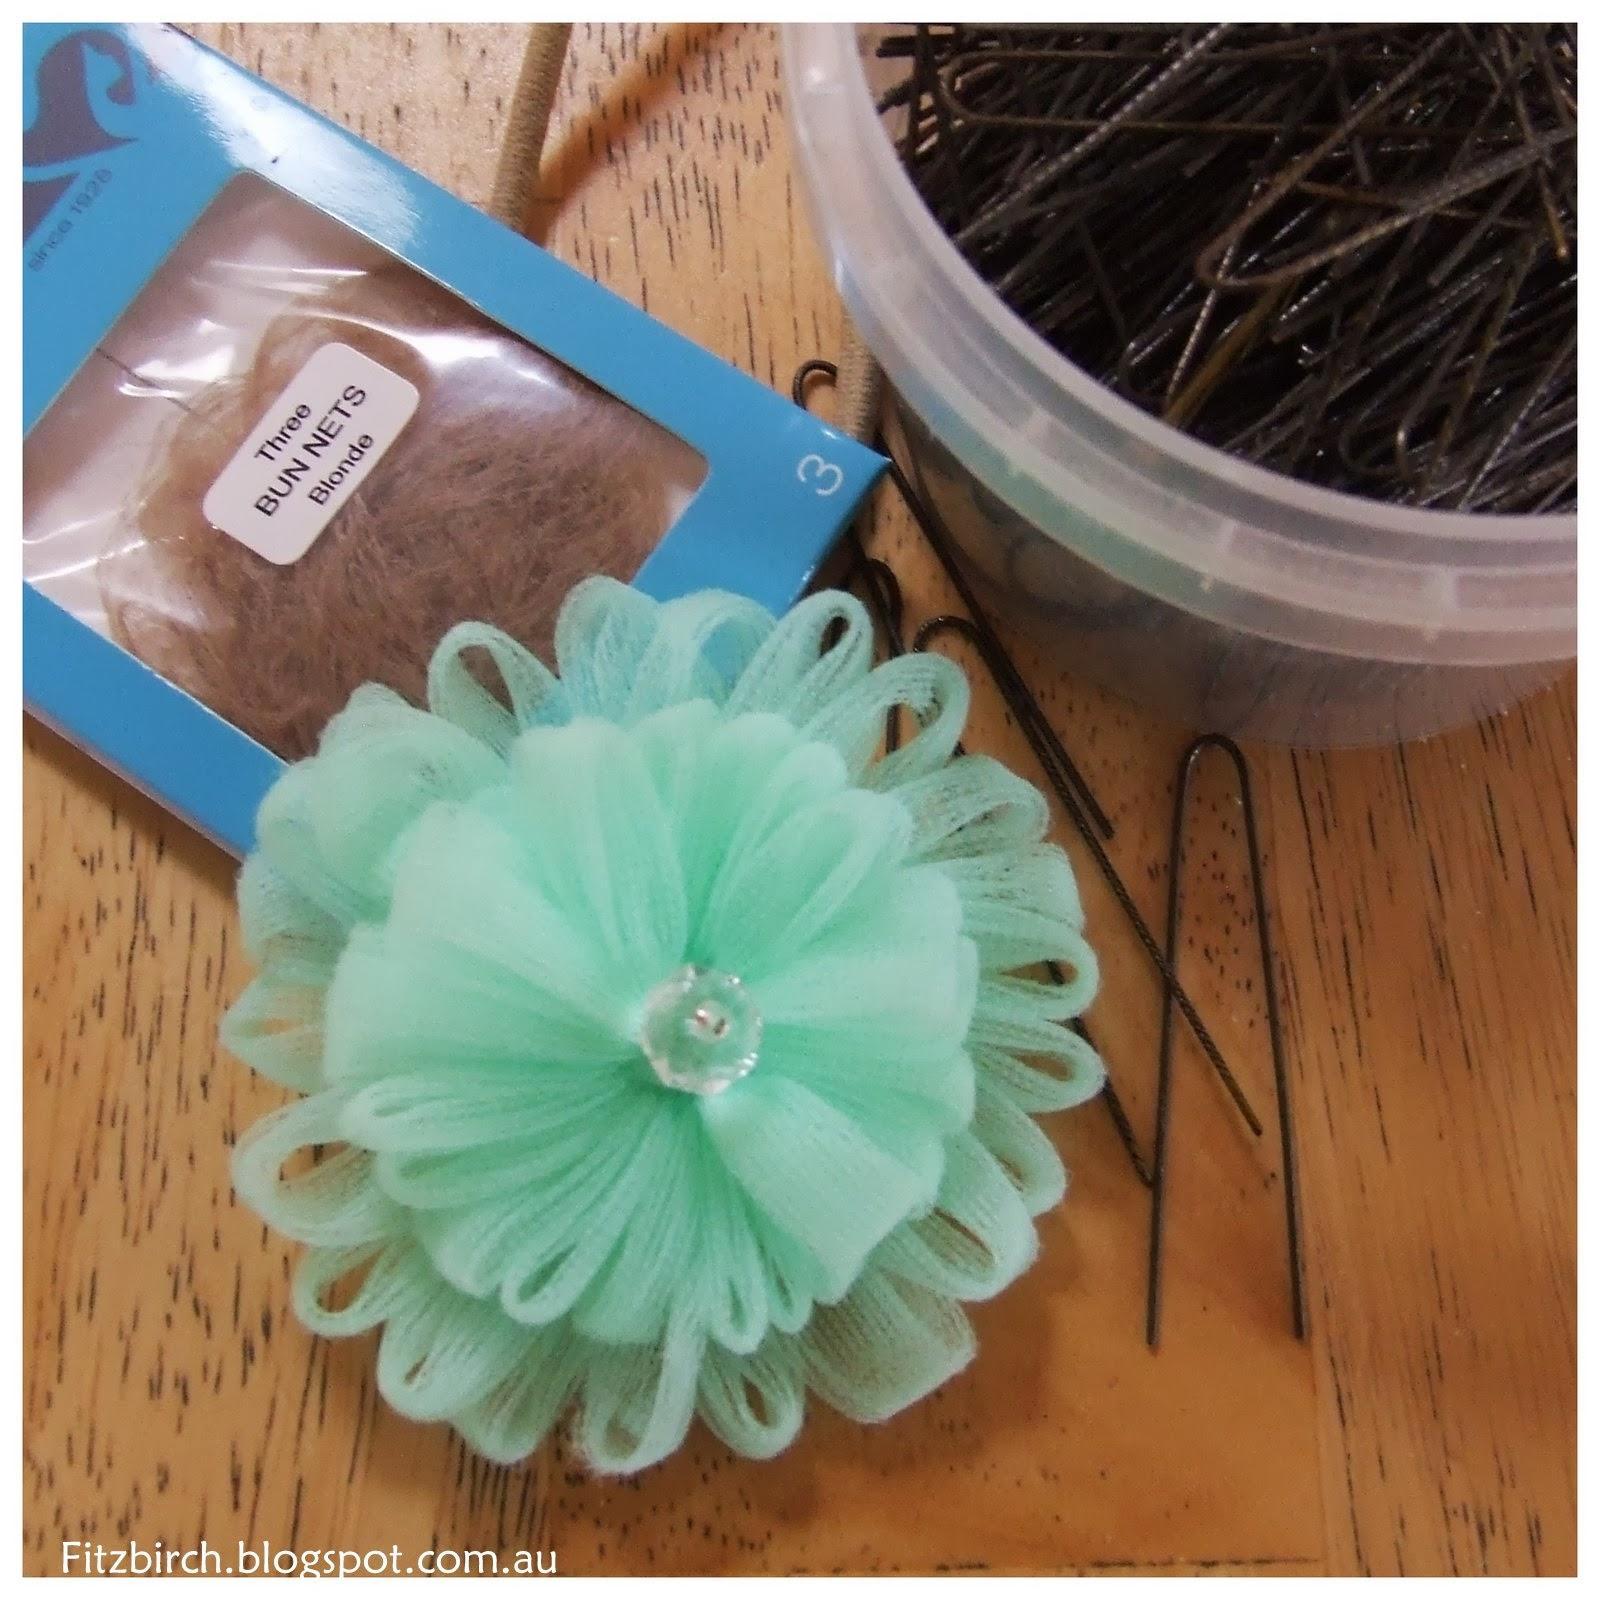 Nylon Knitting Ribbon : Fitzbirch crafts knitlon craftlon and nylon knitting ribbon